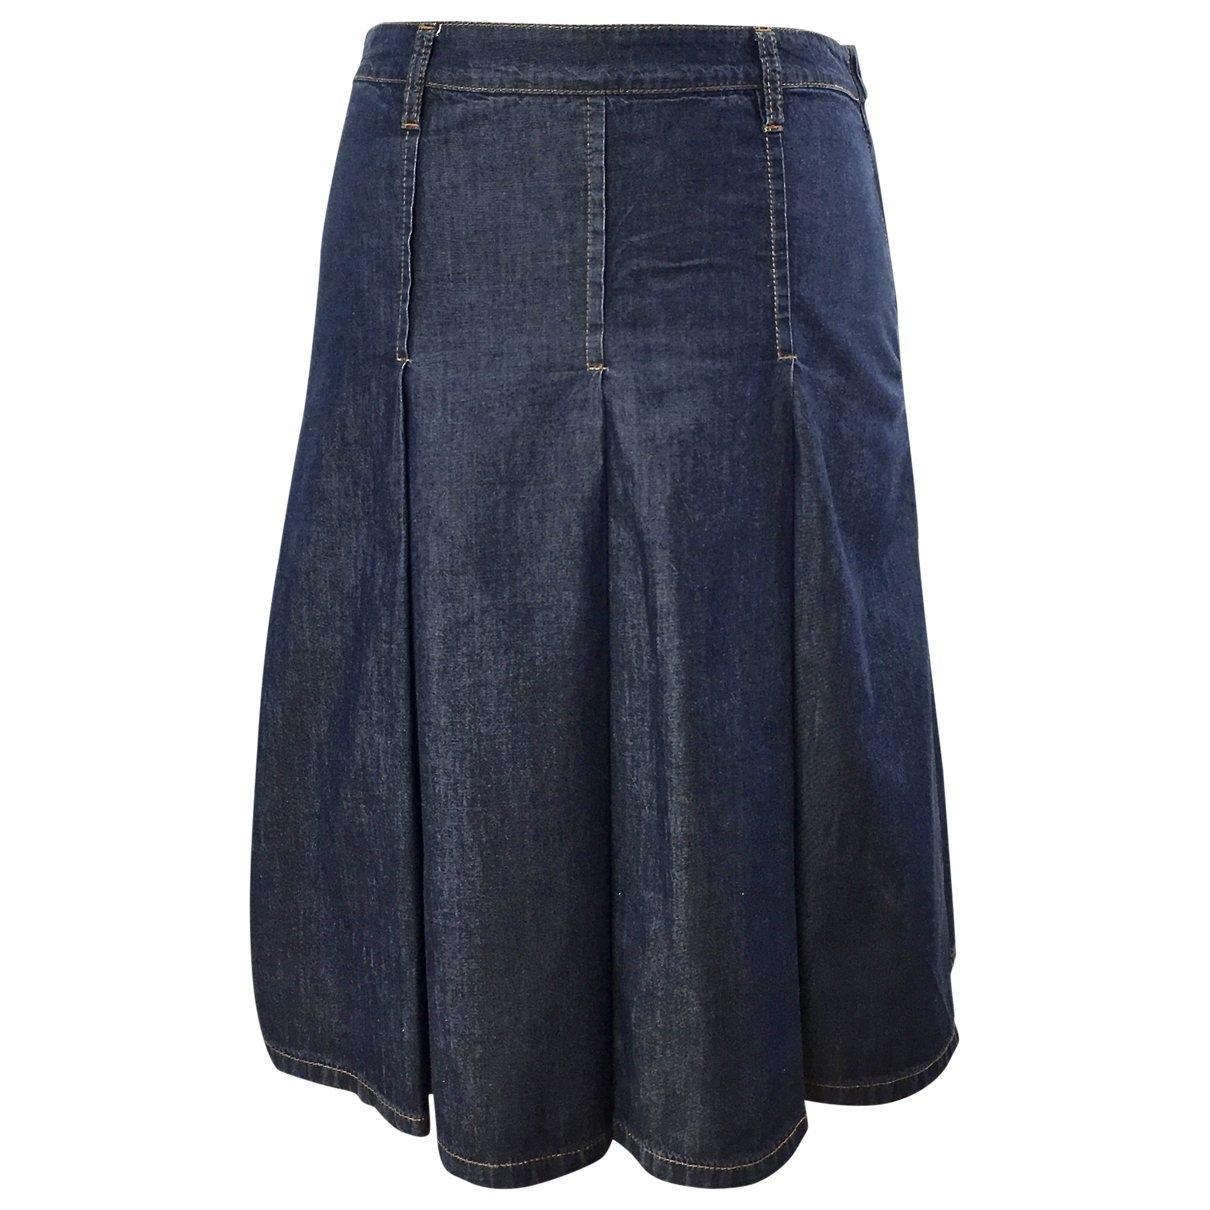 Miu Miu \N Blue Denim - Jeans skirt for Women M International